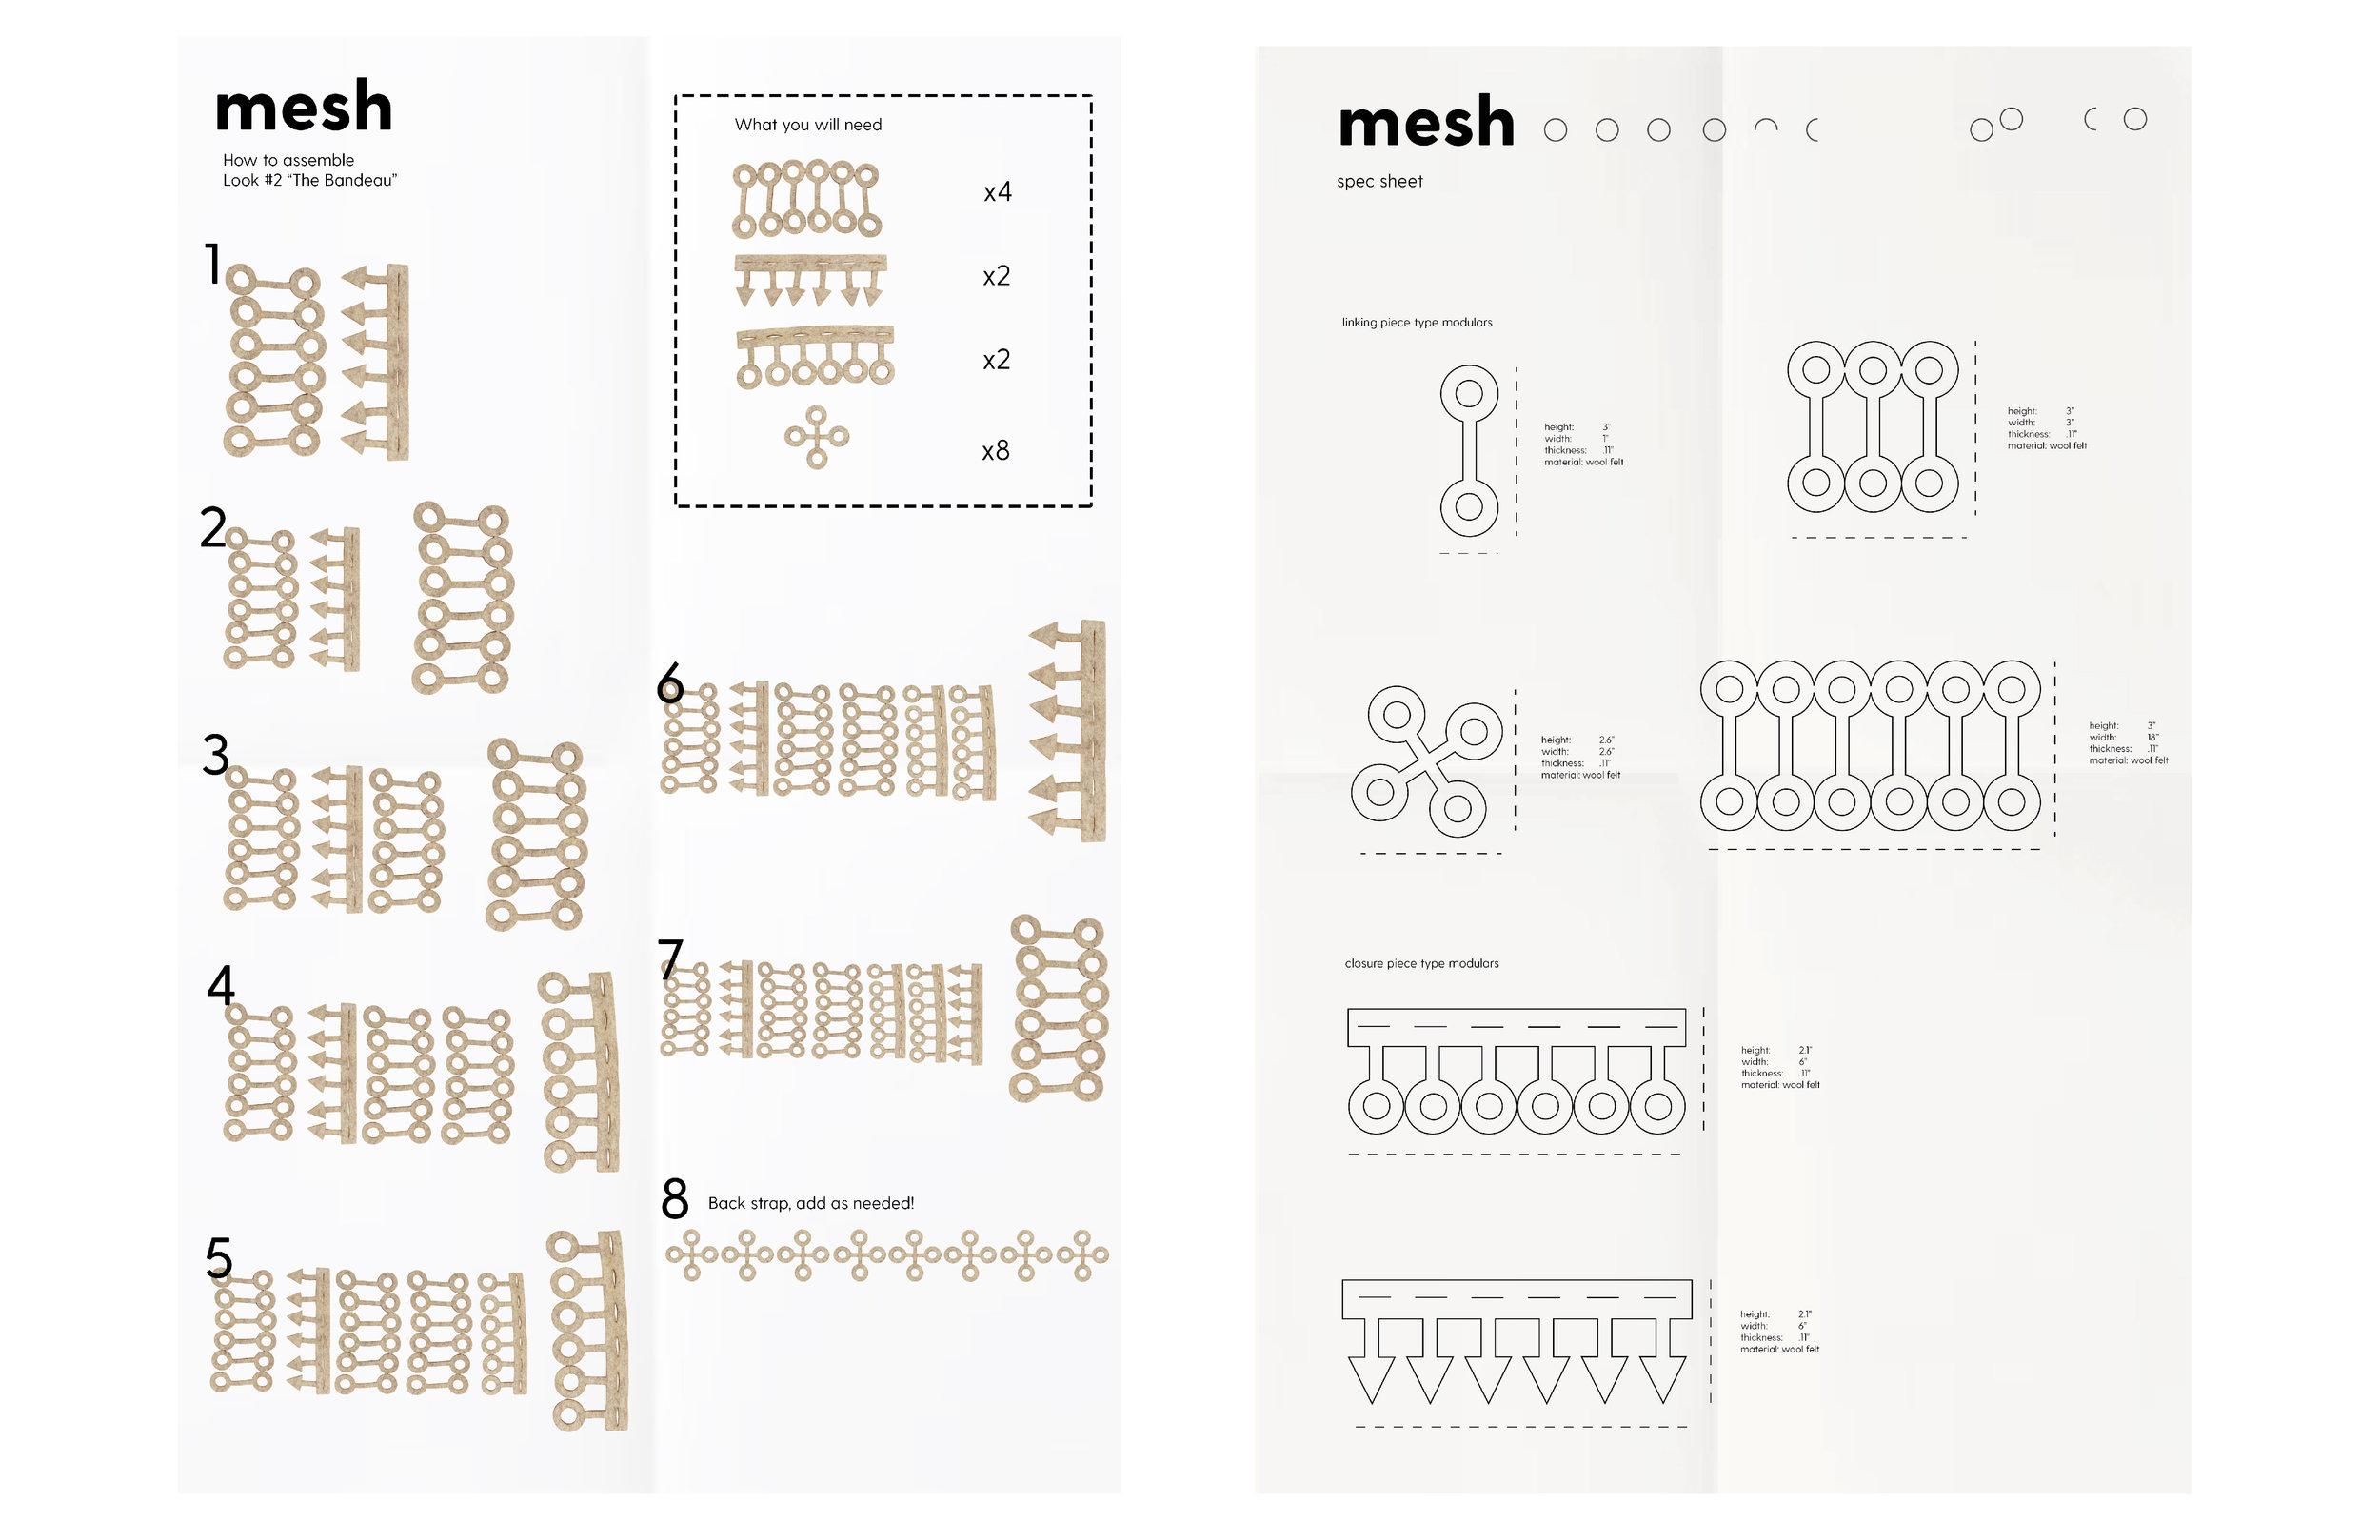 mesh_linkedin_pdf-11.jpg